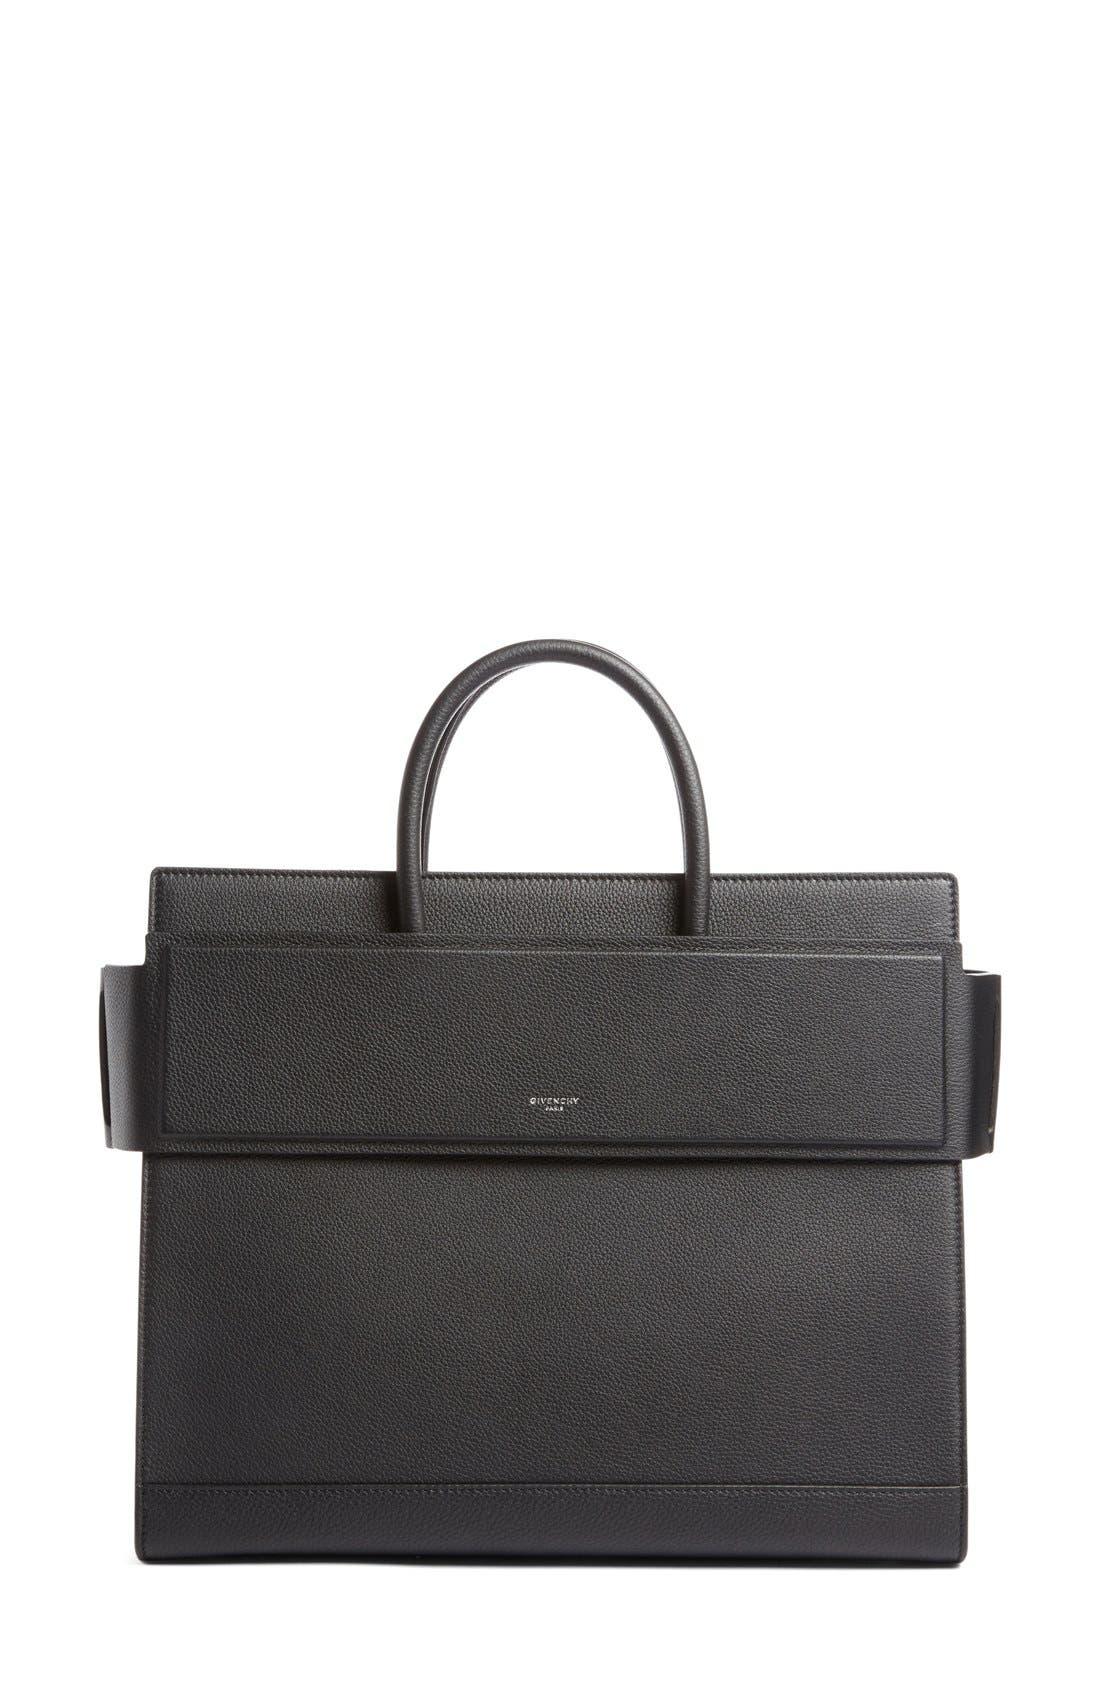 Medium Horizon Grained Calfskin Leather Tote,                         Main,                         color, BLACK